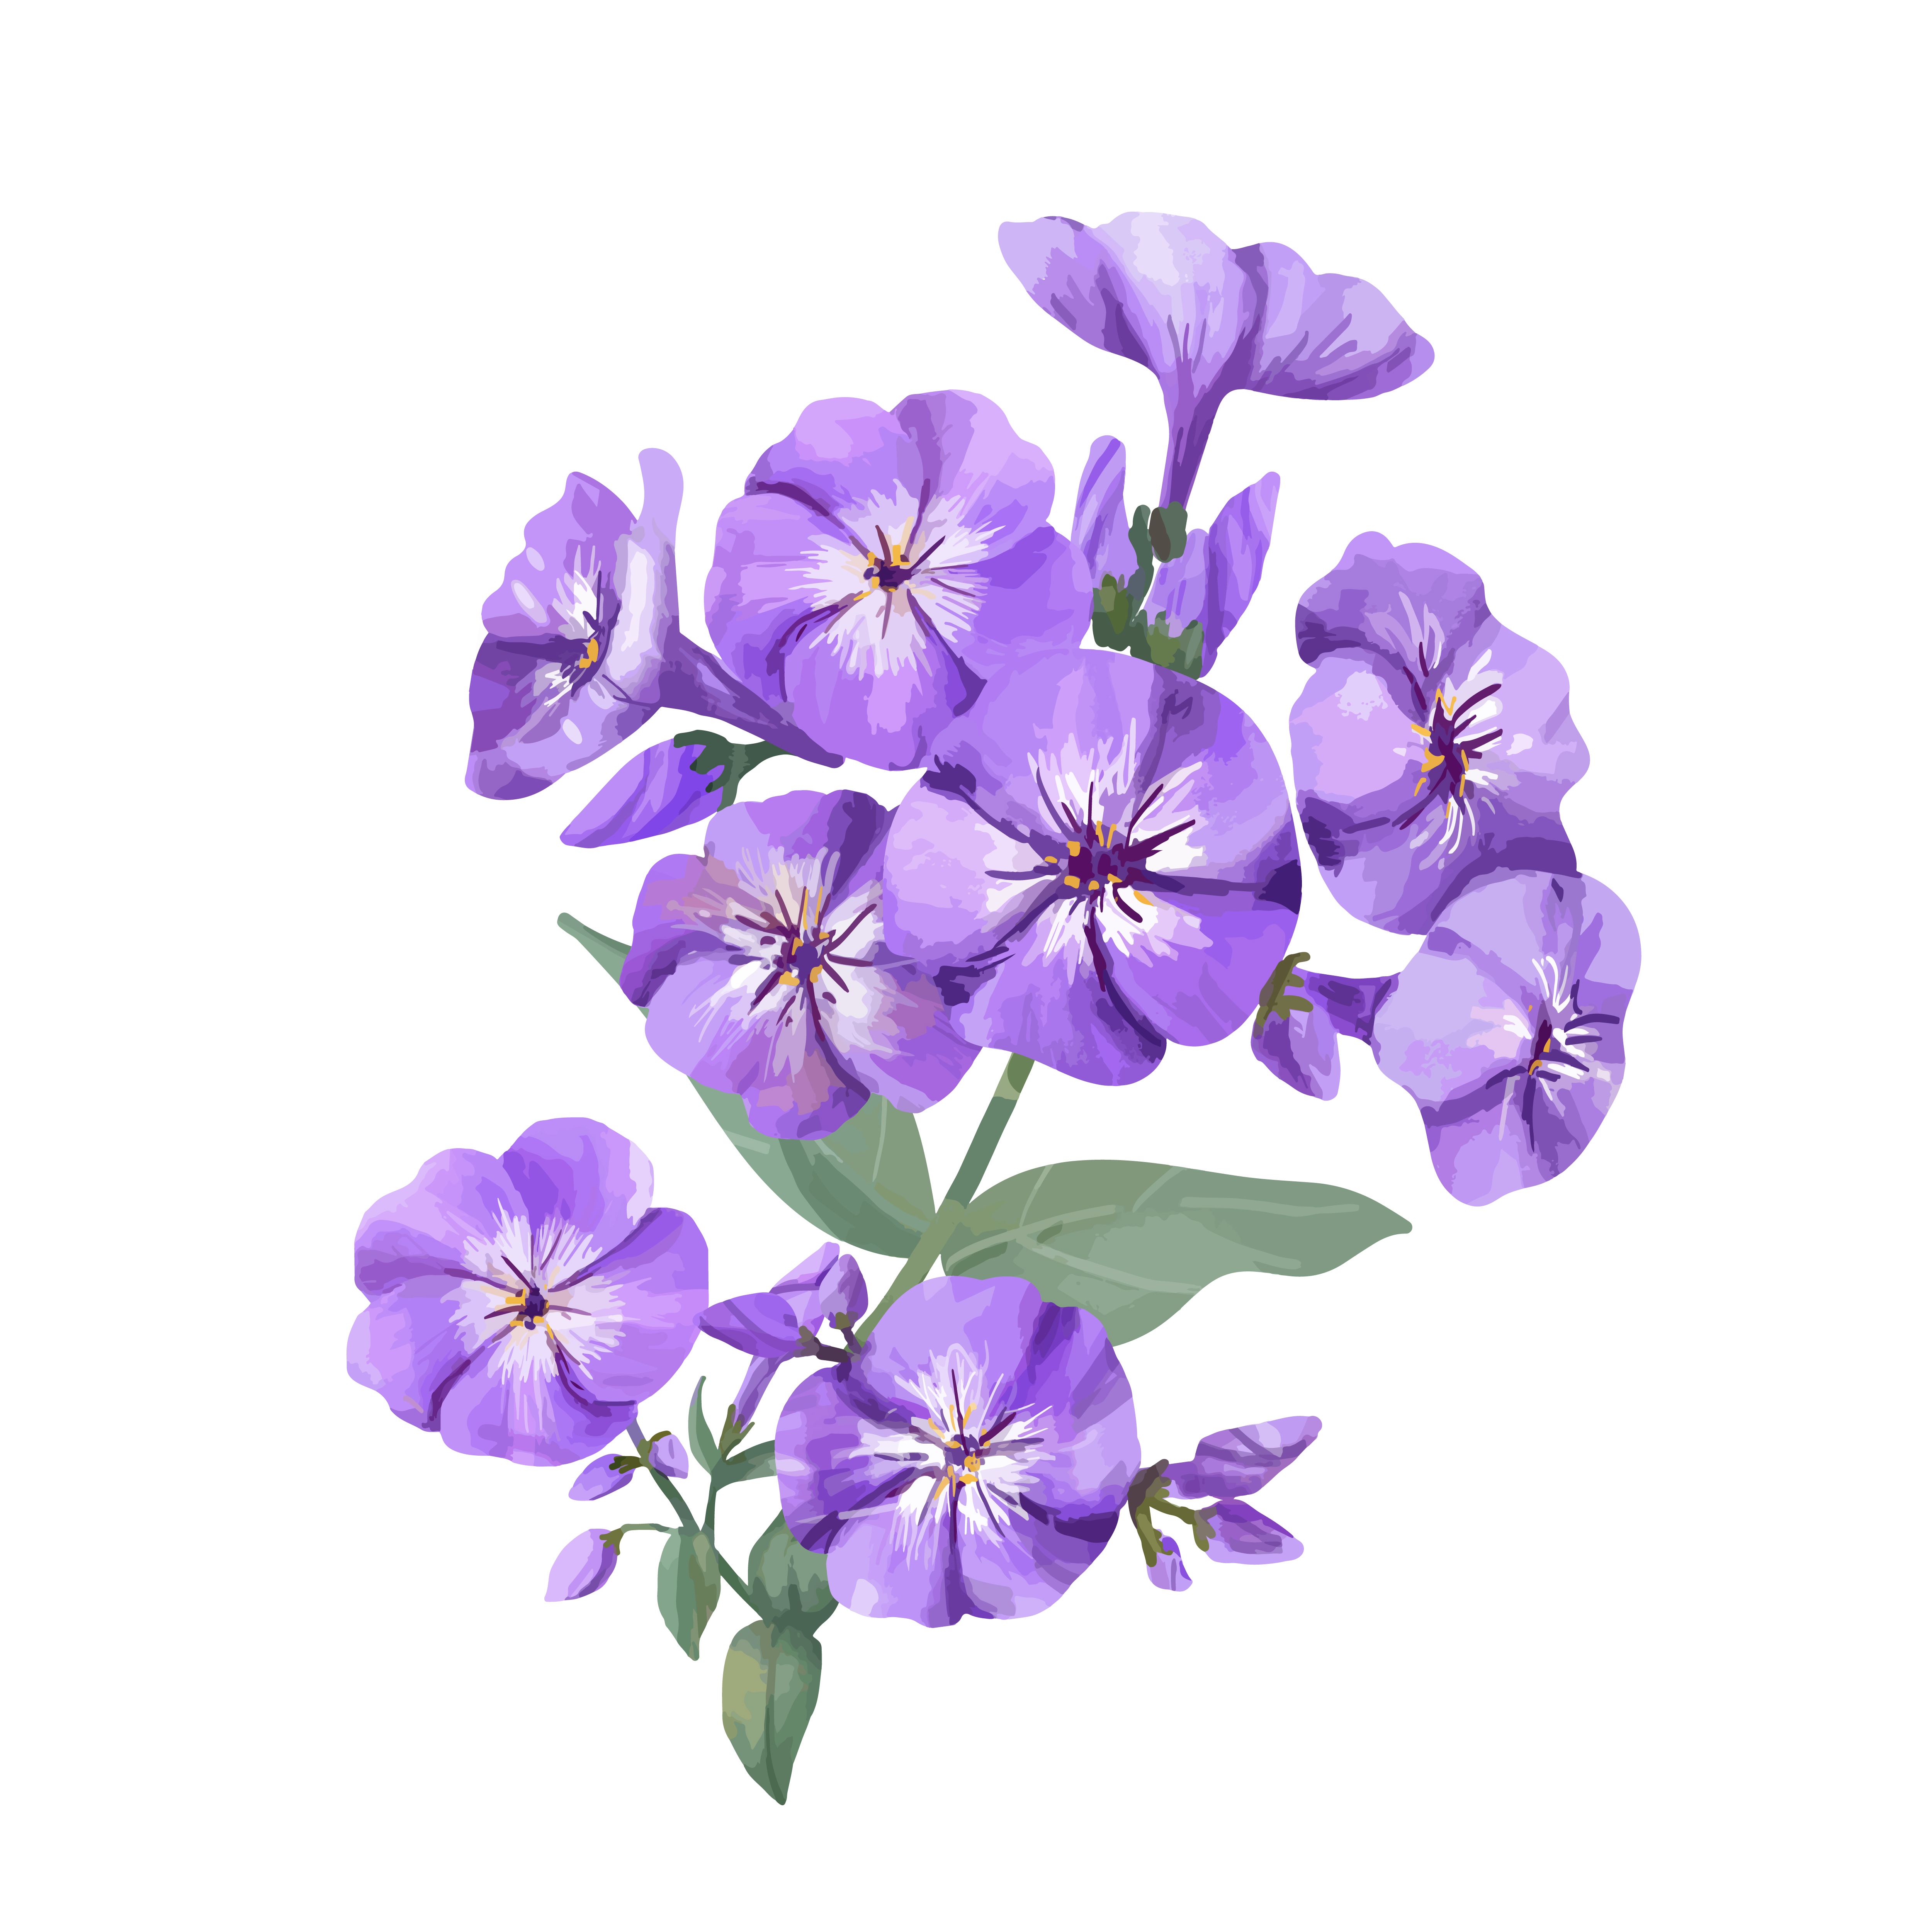 Hand drawn purple phlox flower illustration - Download Free Vectors, Clipart Graphics & Vector Art